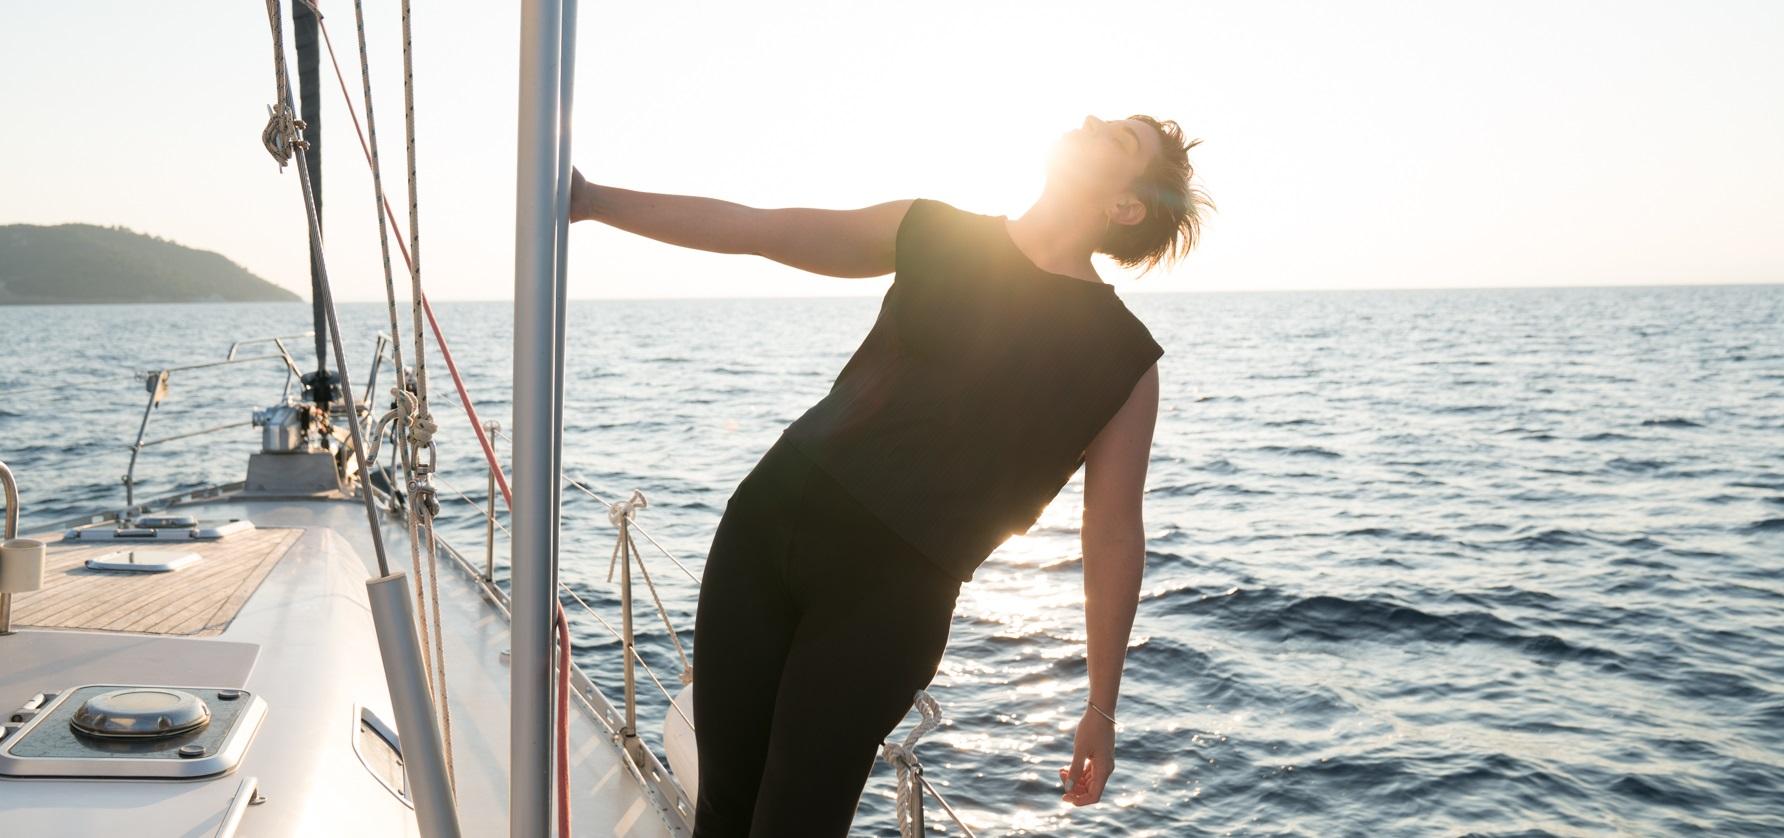 Sailing tour in Thessaloniki